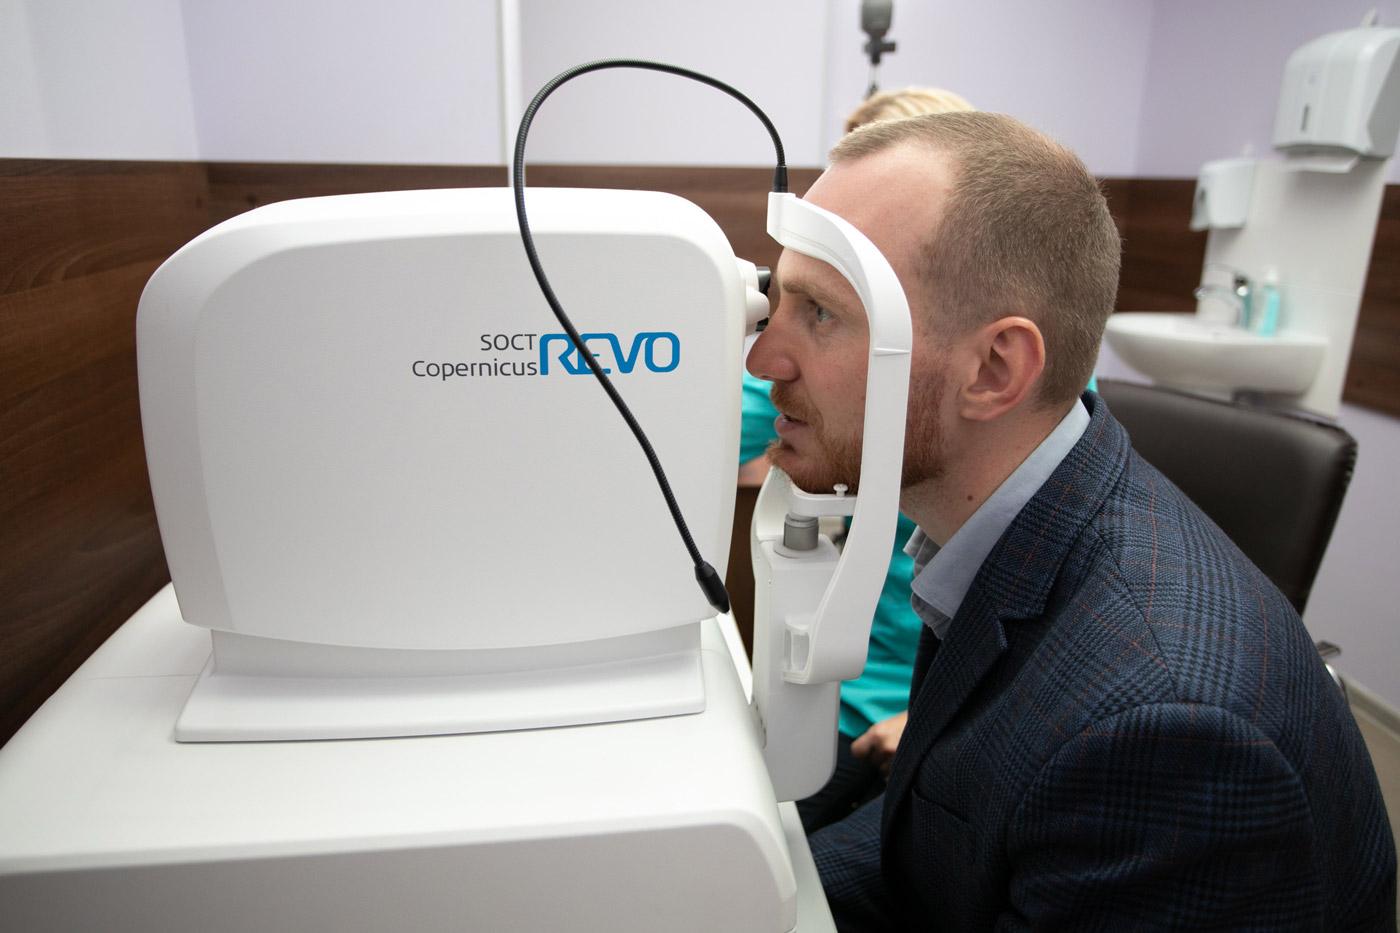 лечение тромбоза вен глаза в харькове